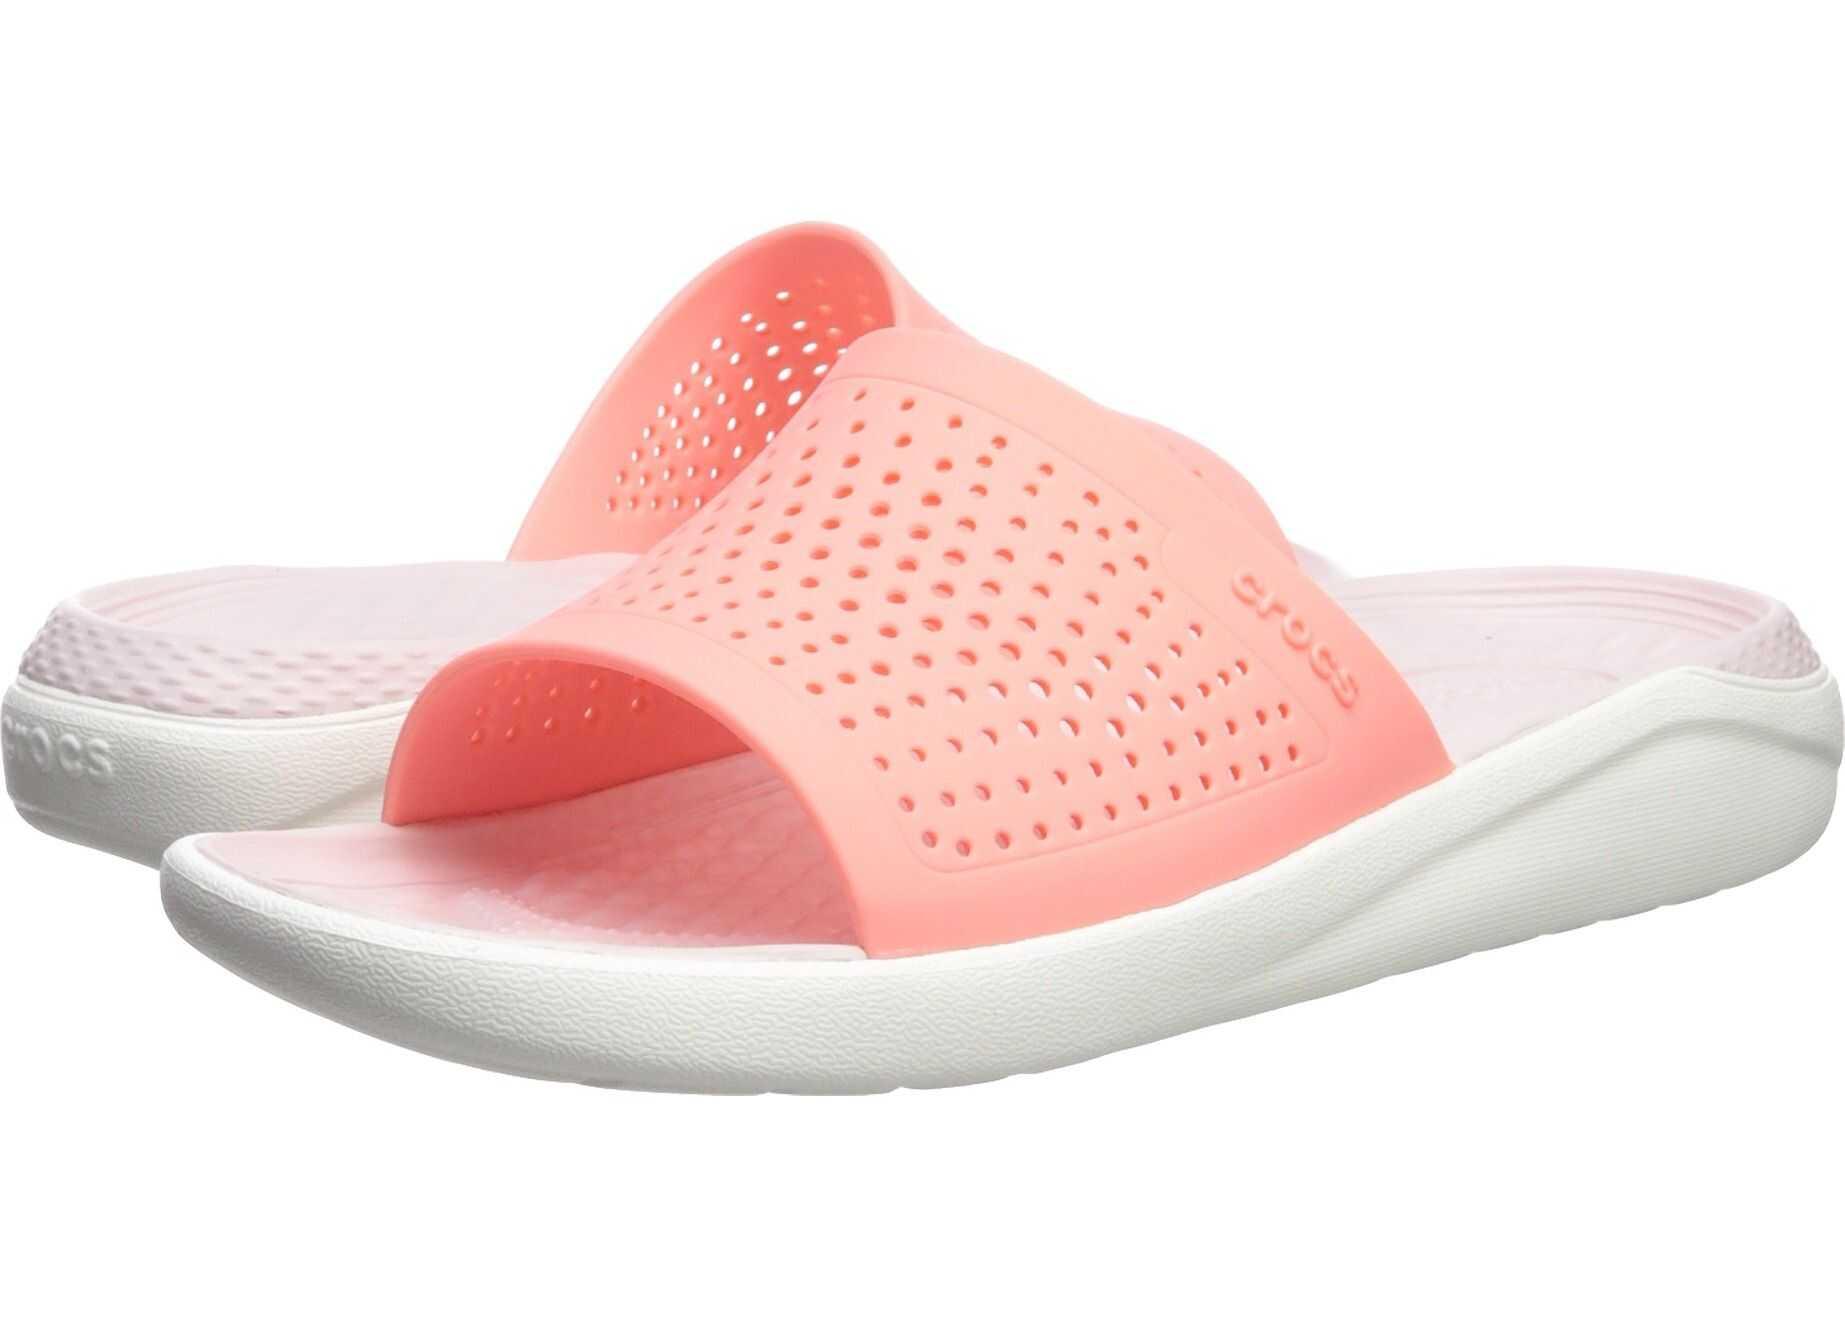 Crocs LiteRide Slide Melon/White 1